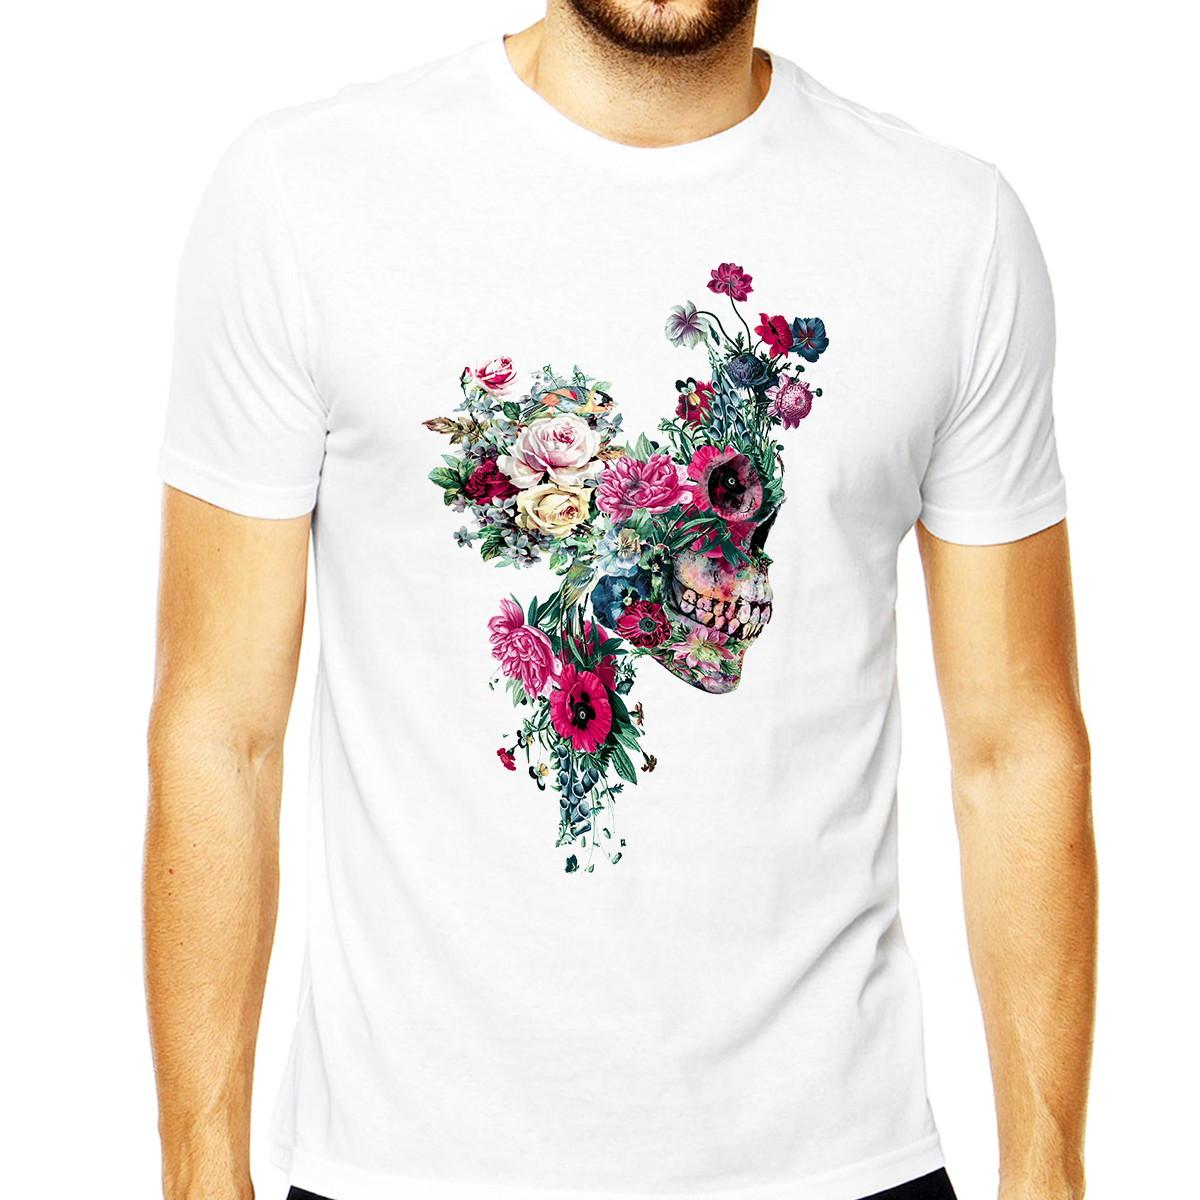 Camisetas Skull Floral Caveiras Masculinas Camisa Skull Flor no Elo7 ... 8b233593a84